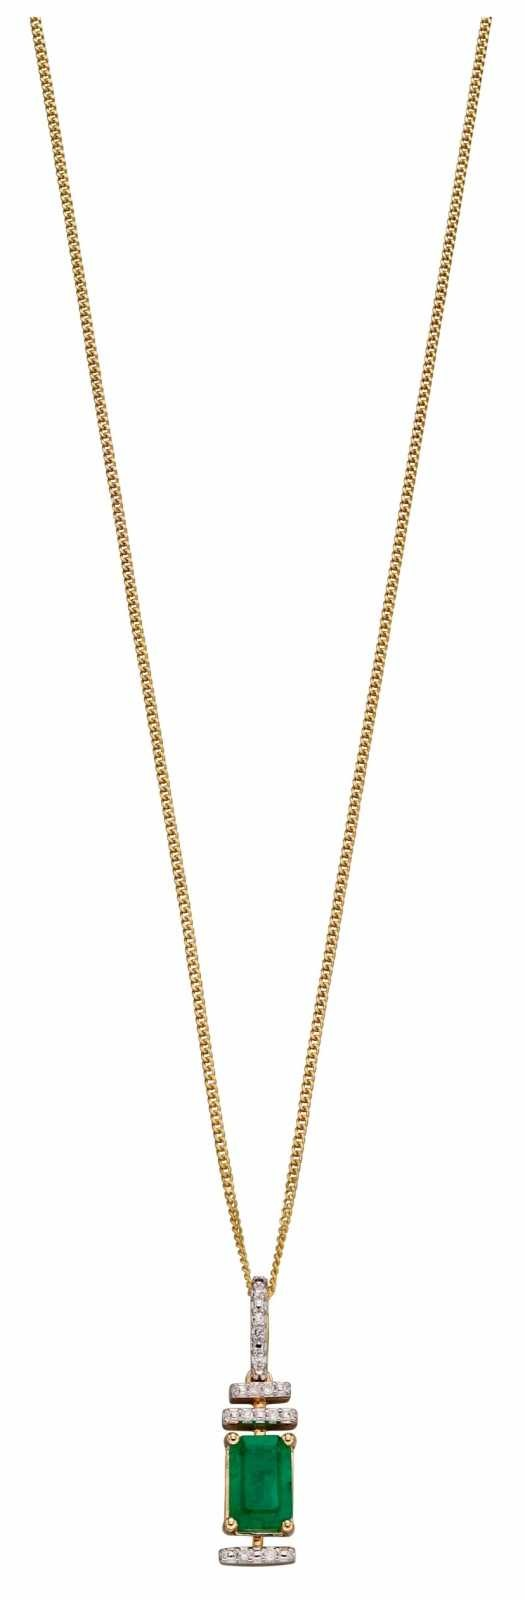 Elements Gold 9k Yellow Gold Emerald Diamond Deco Pendant Only GP2185G